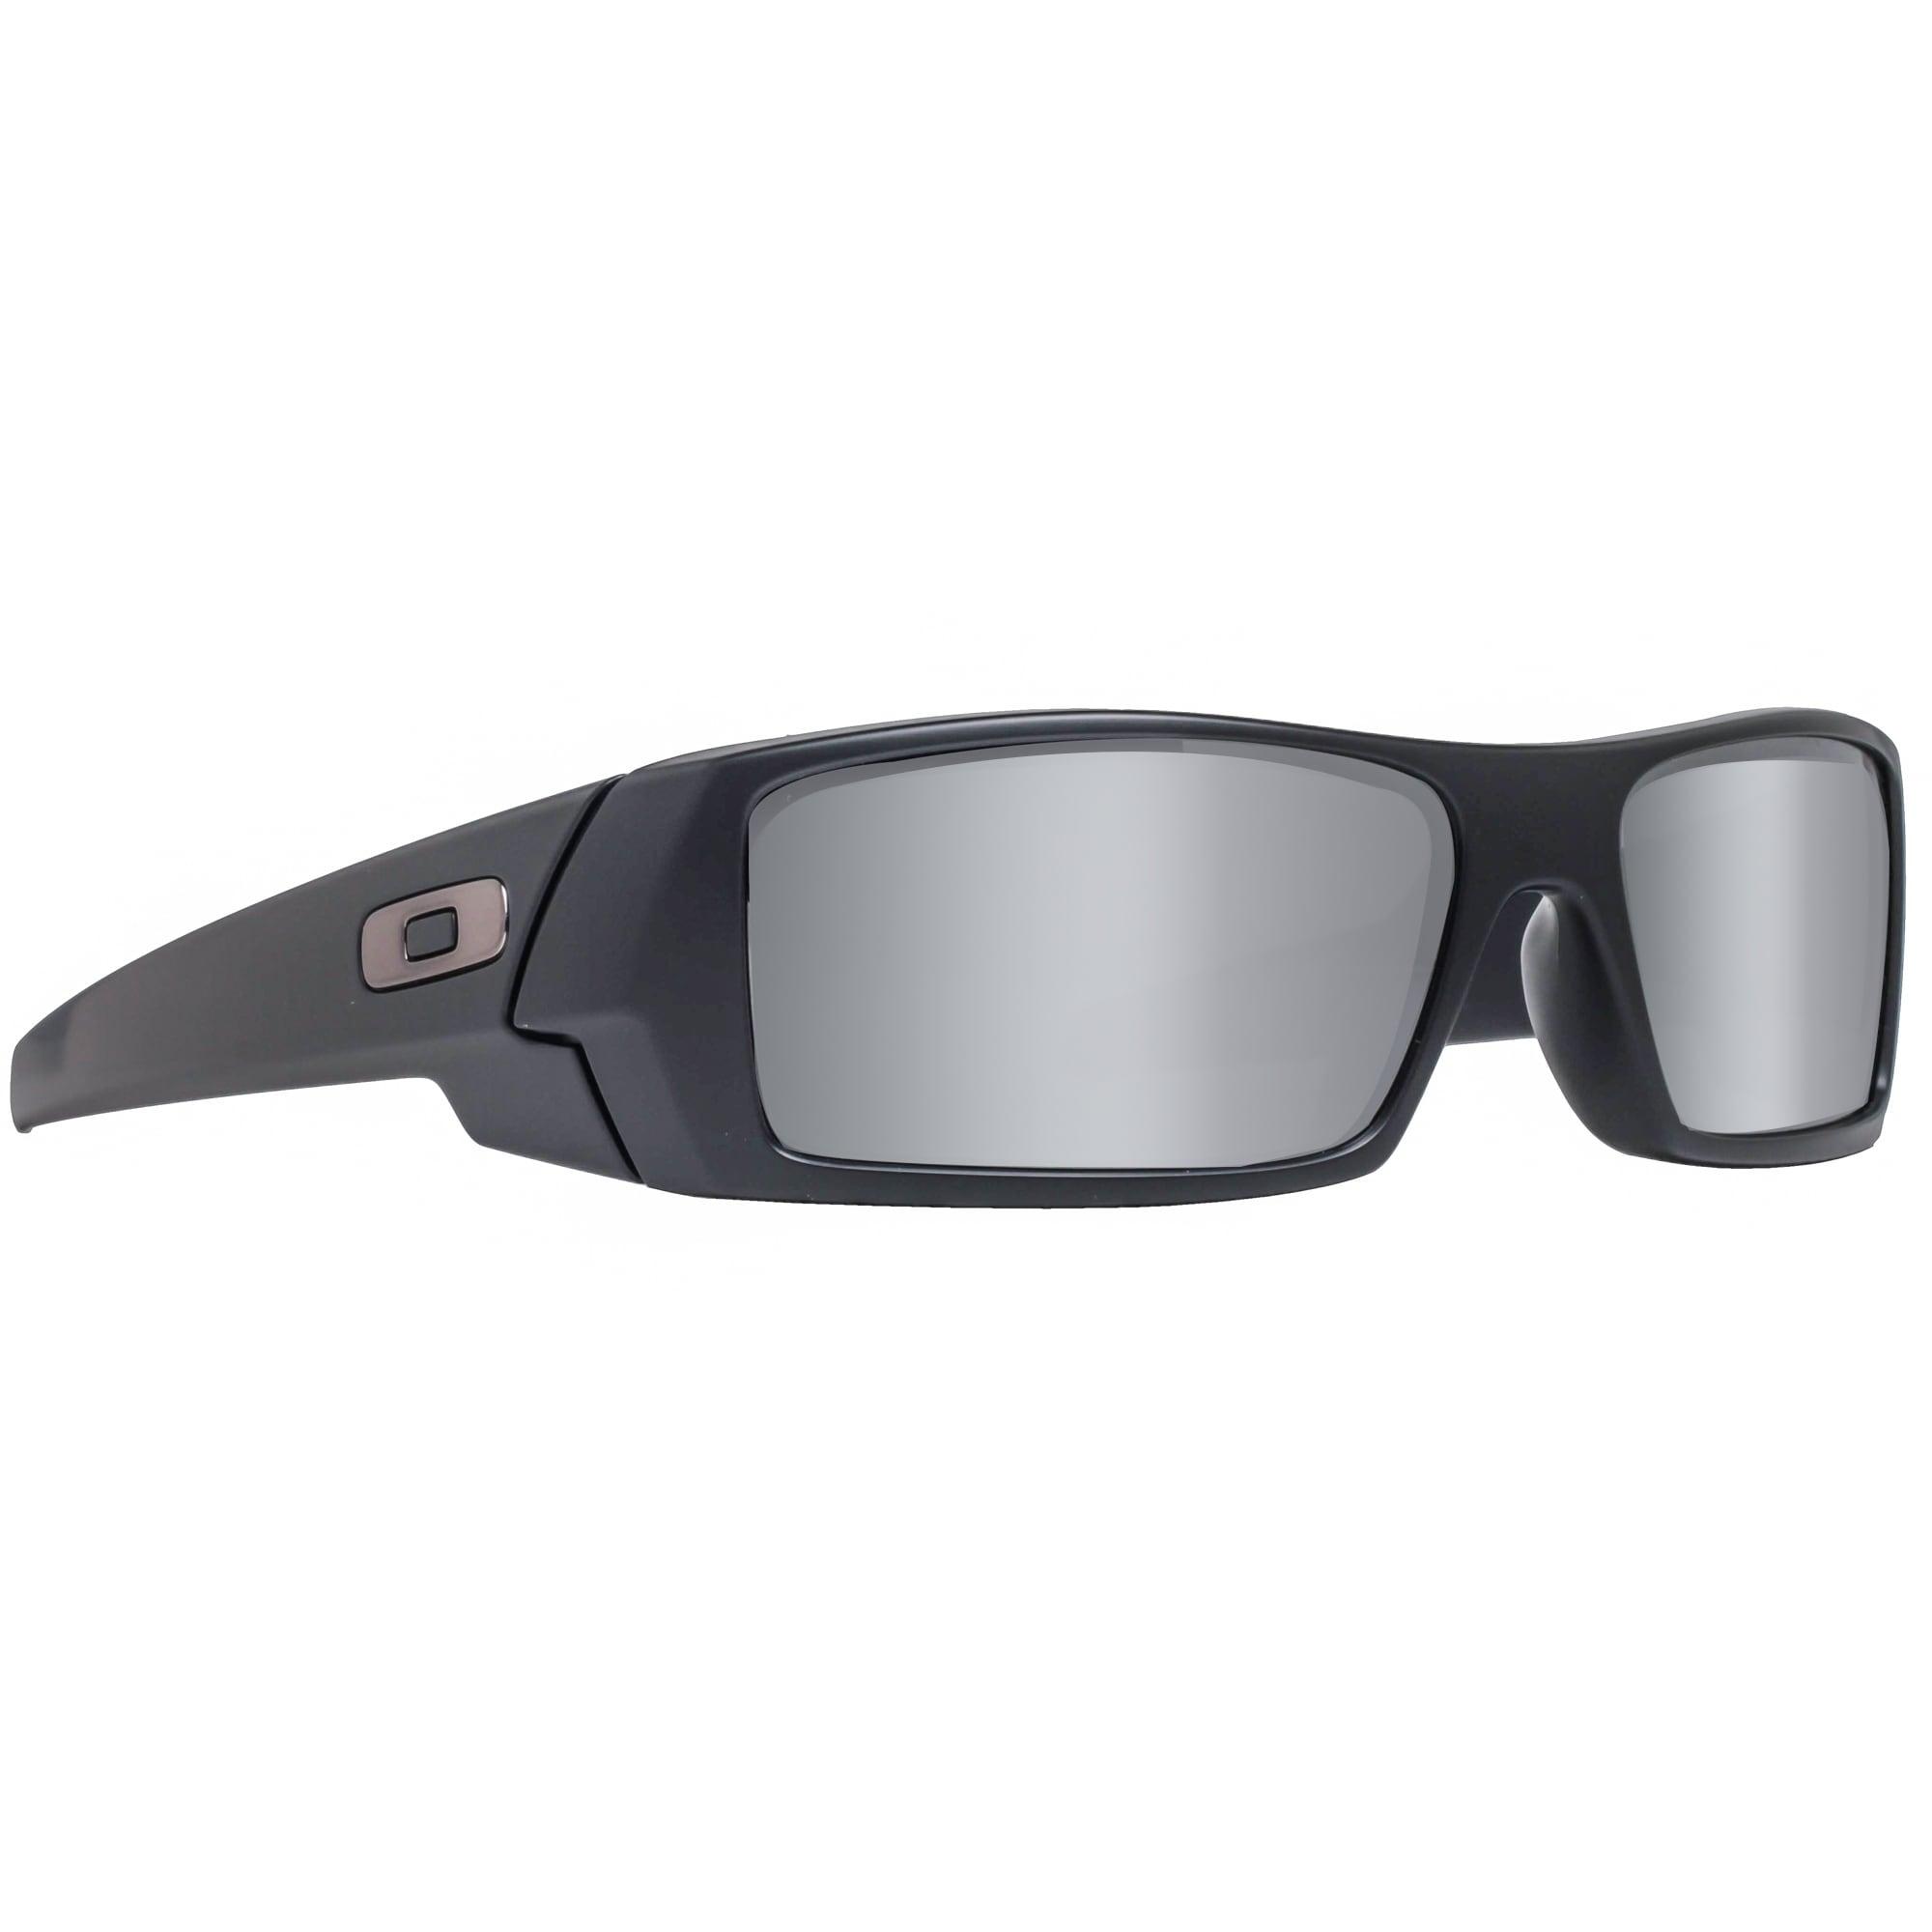 f7b83bc0ed ... best price shop oakley gascan 24 435 matte black iridium sport wrap  sunglasses matte black 60mm